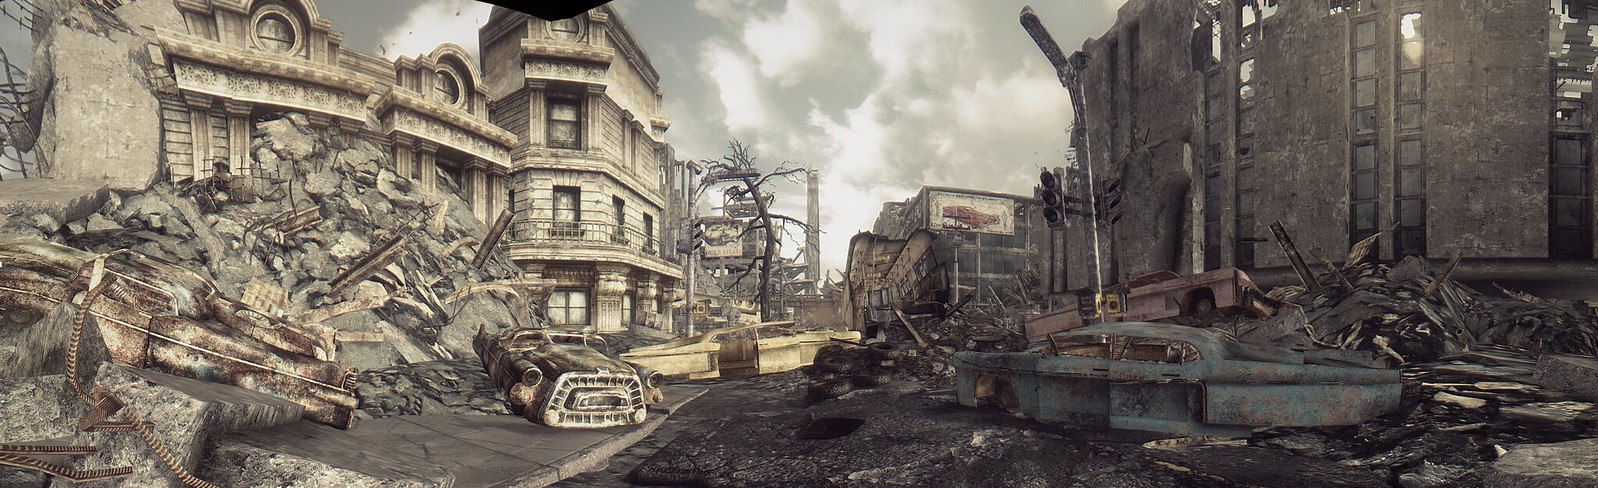 Fallout Screenshots XIII - Page 7 42502590270_829d02536d_h